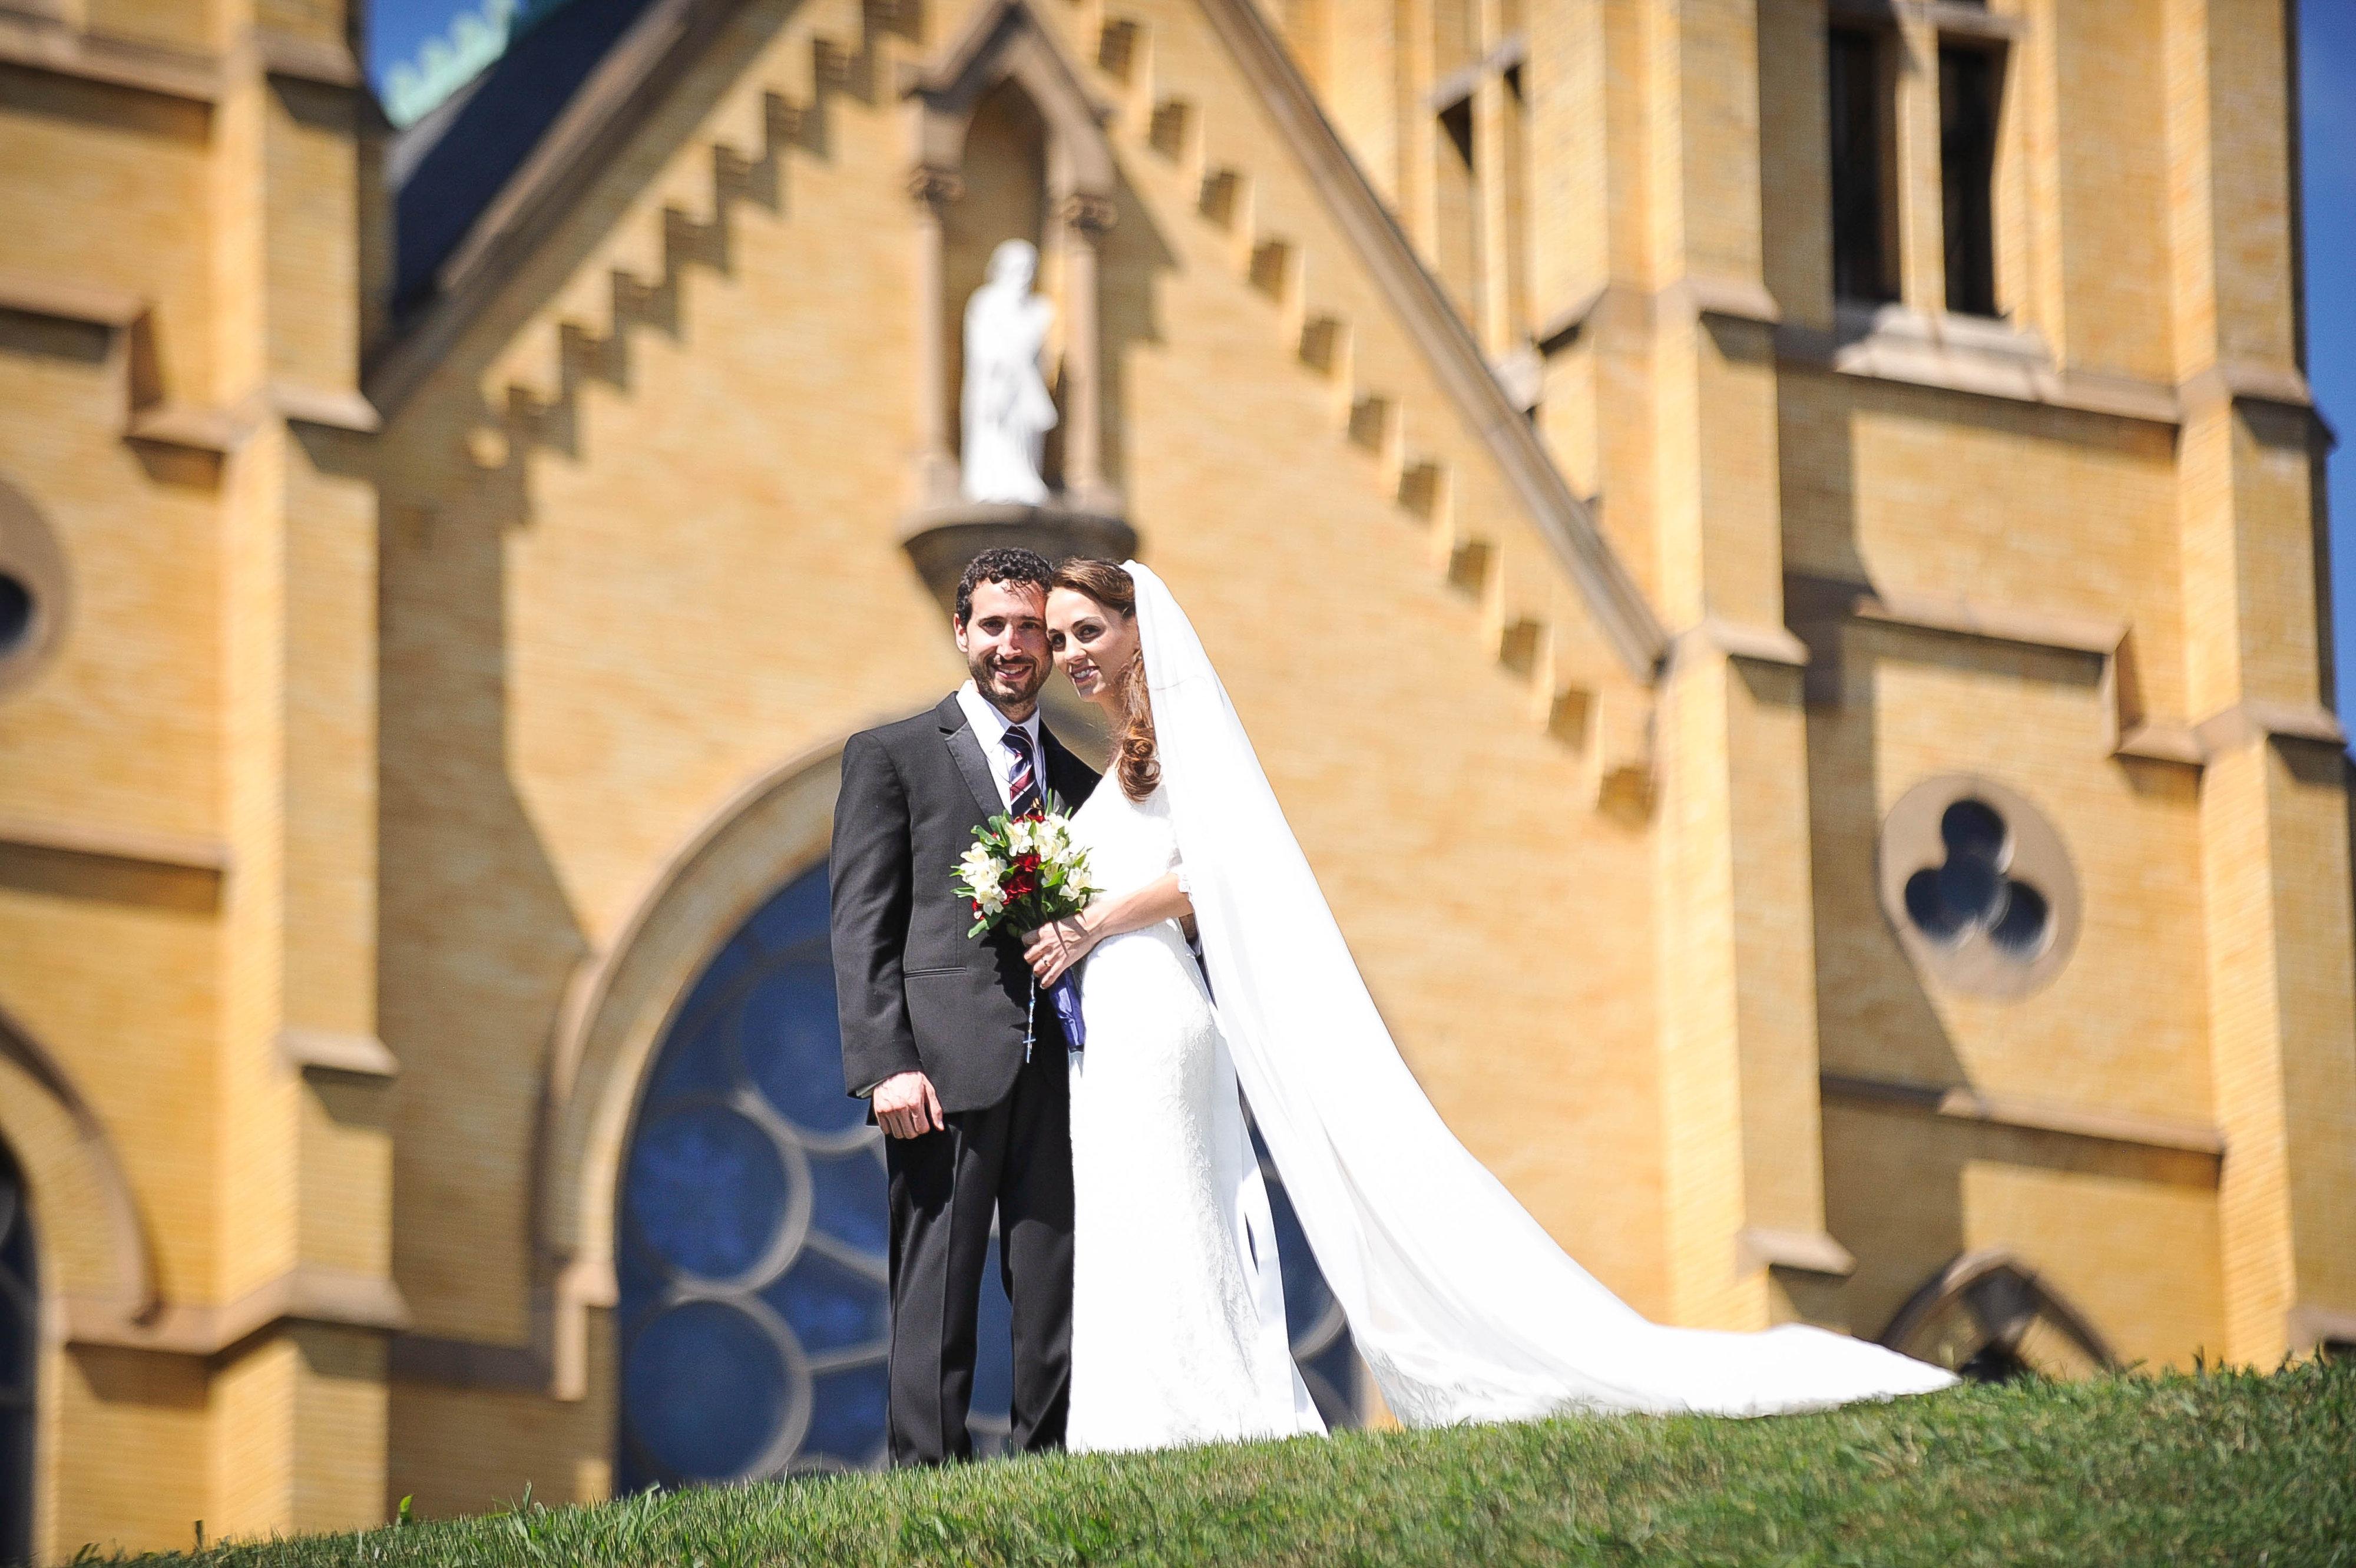 Laux Wedding 2017!